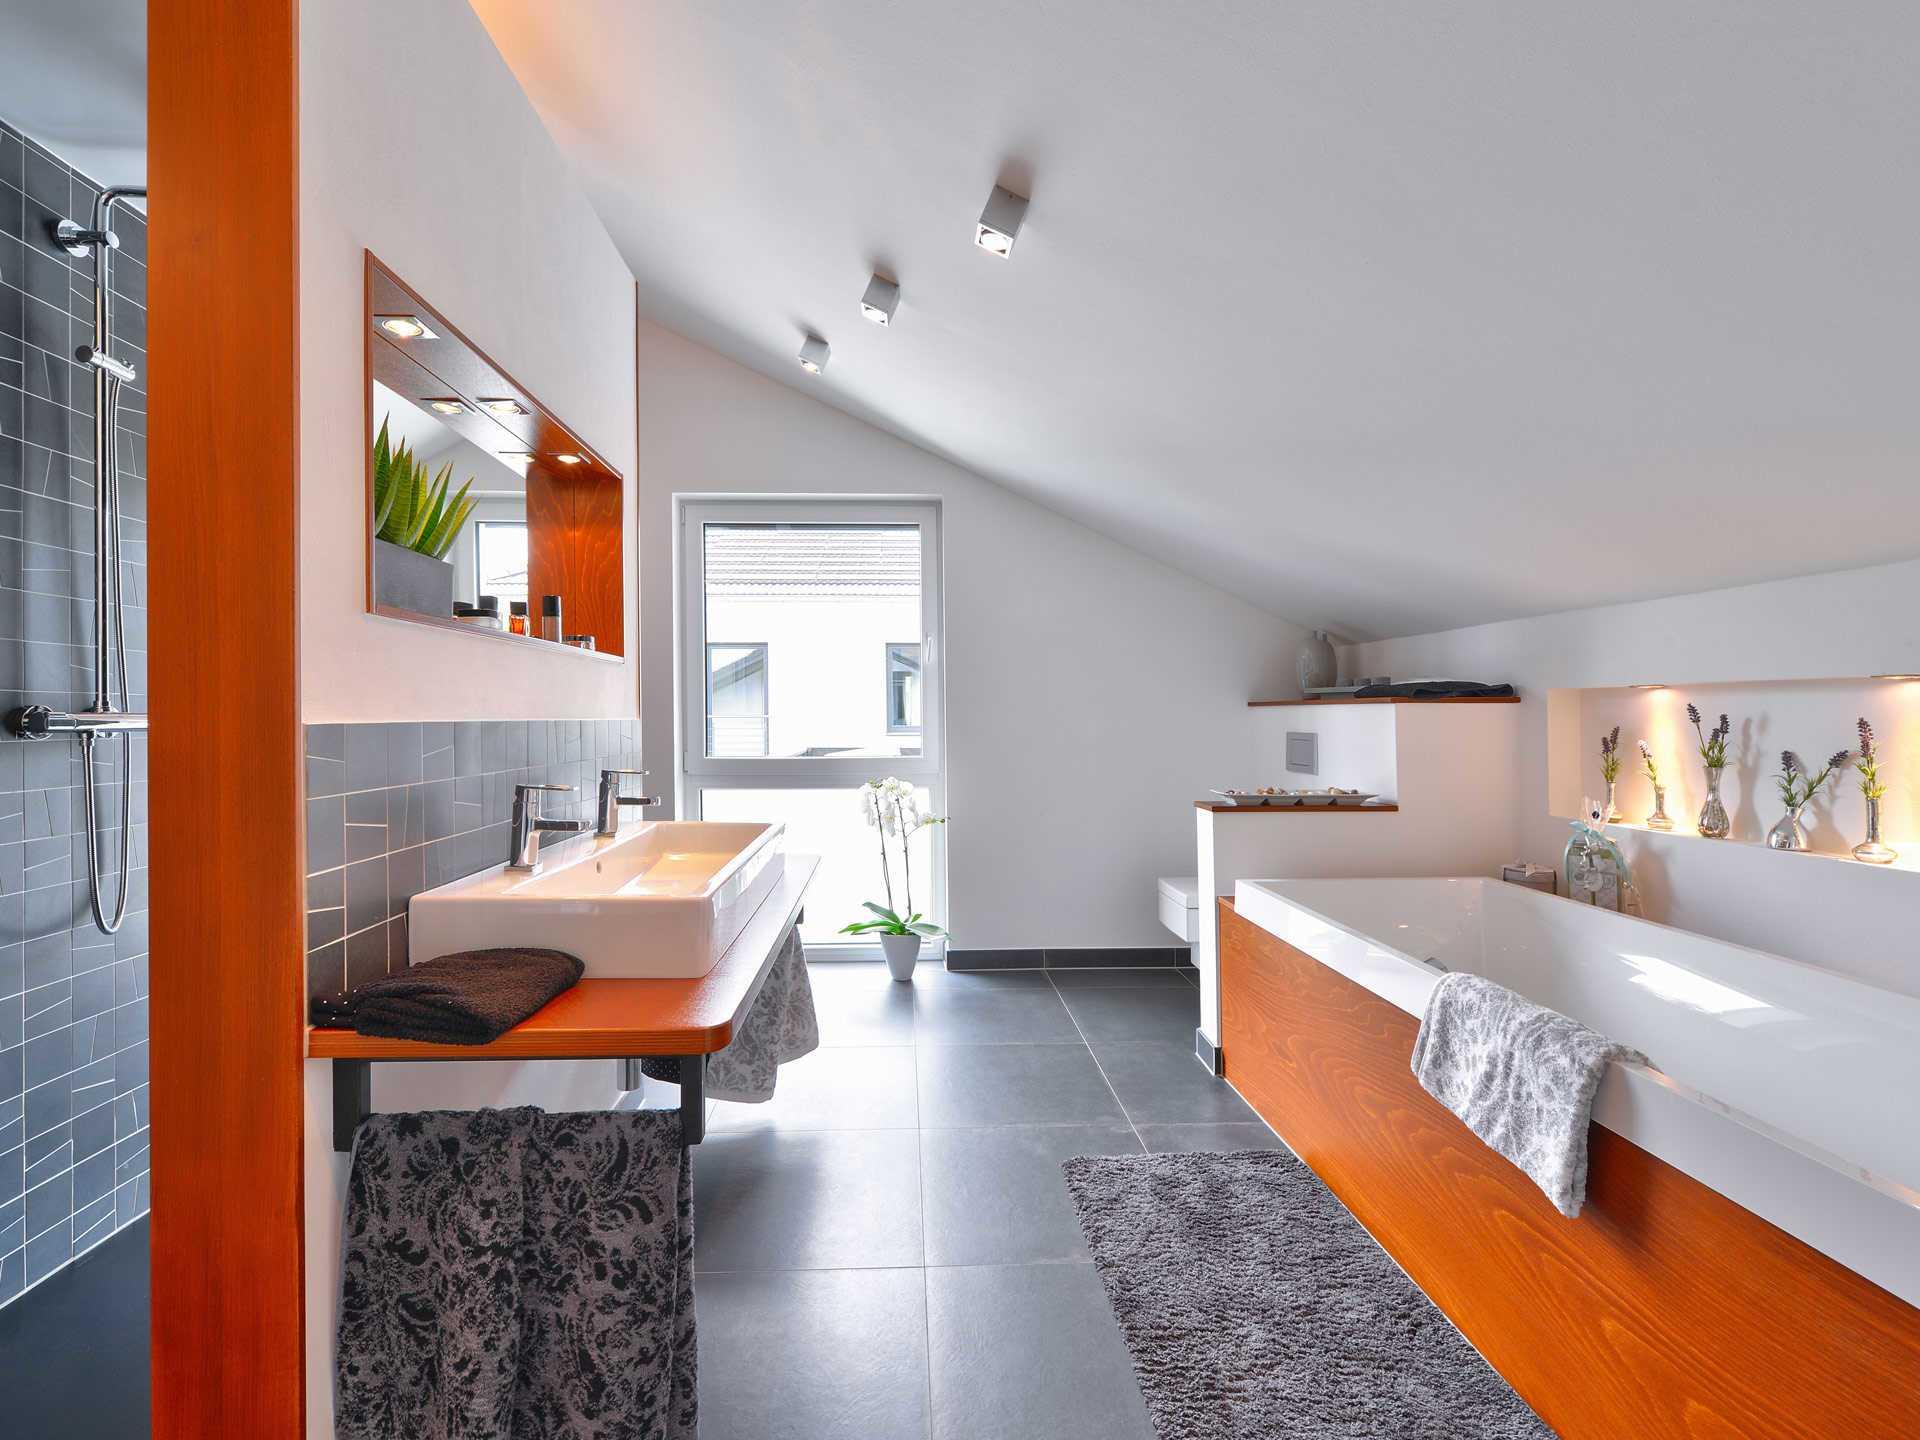 Musterhaus badezimmer  Wuppertal - Partner-Haus